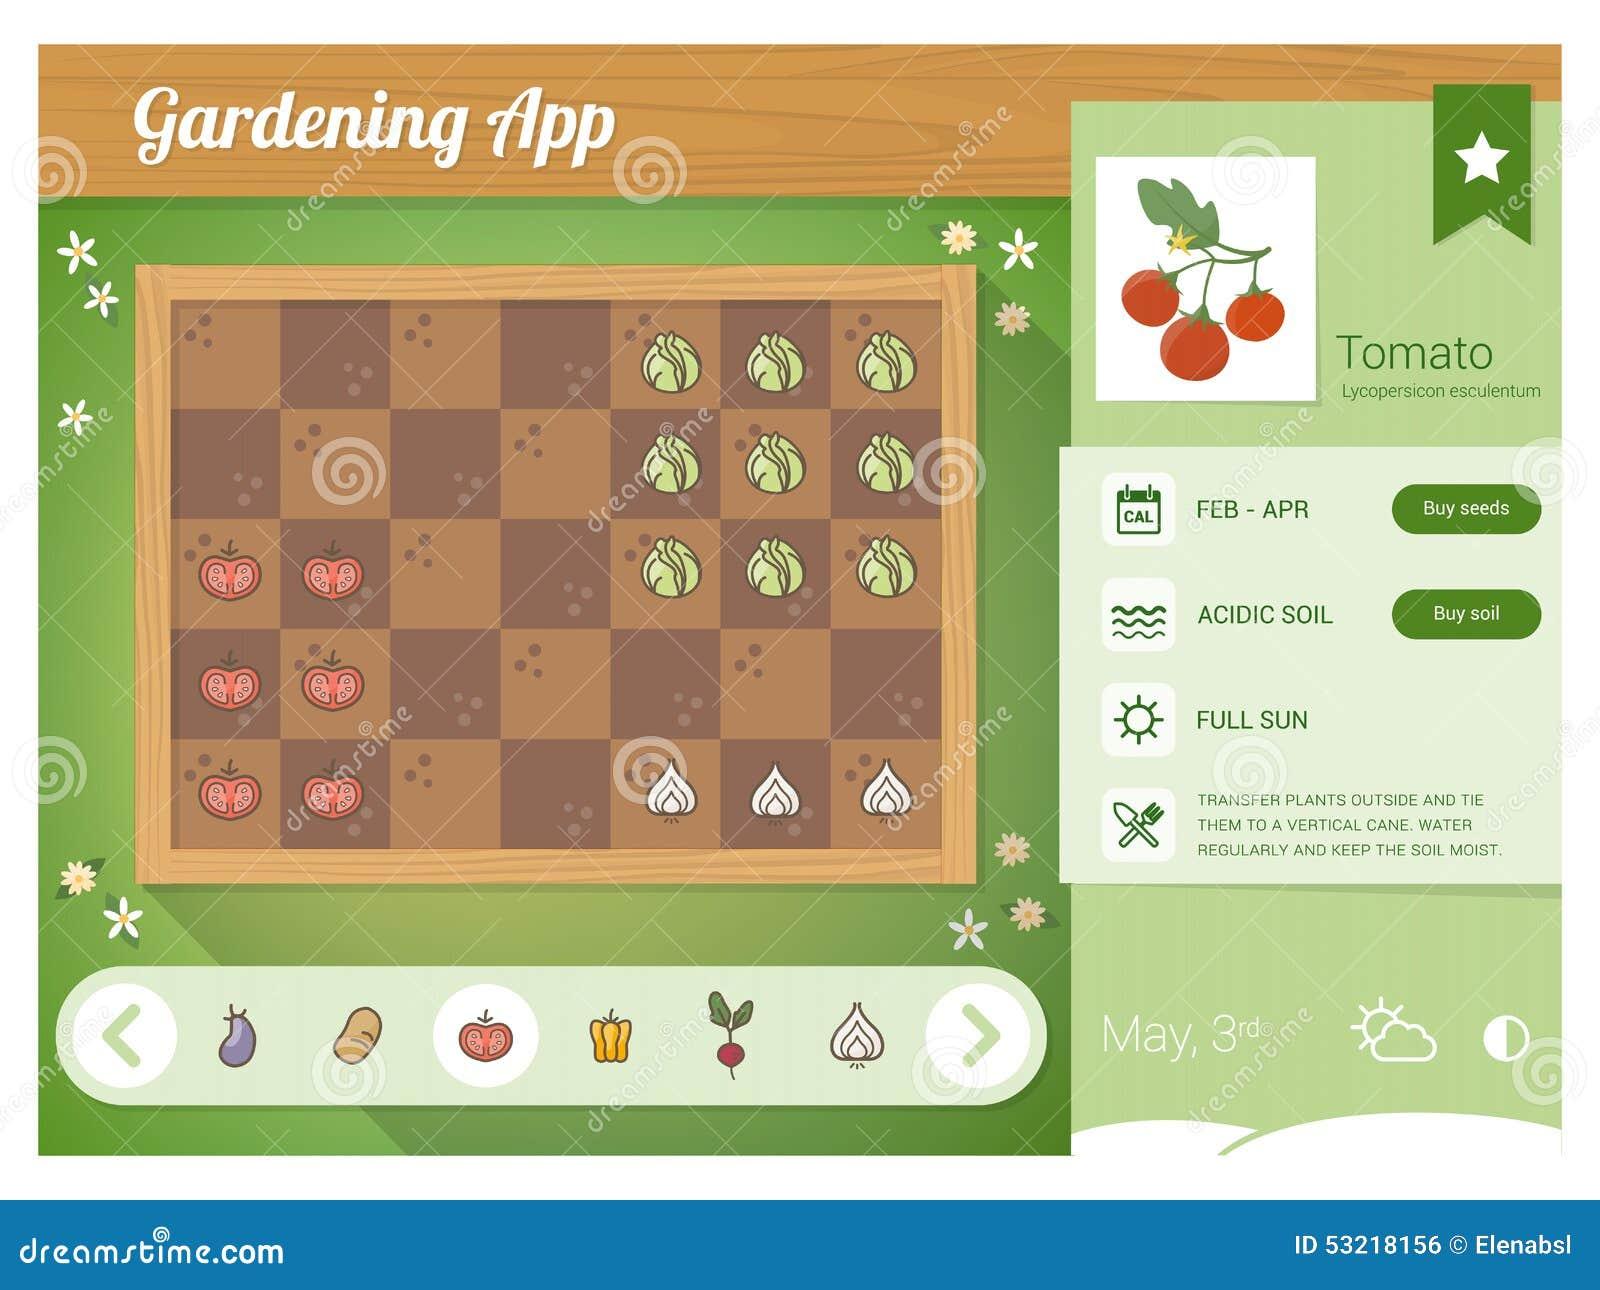 Garden planner app stock vector. Illustration of gardening ...